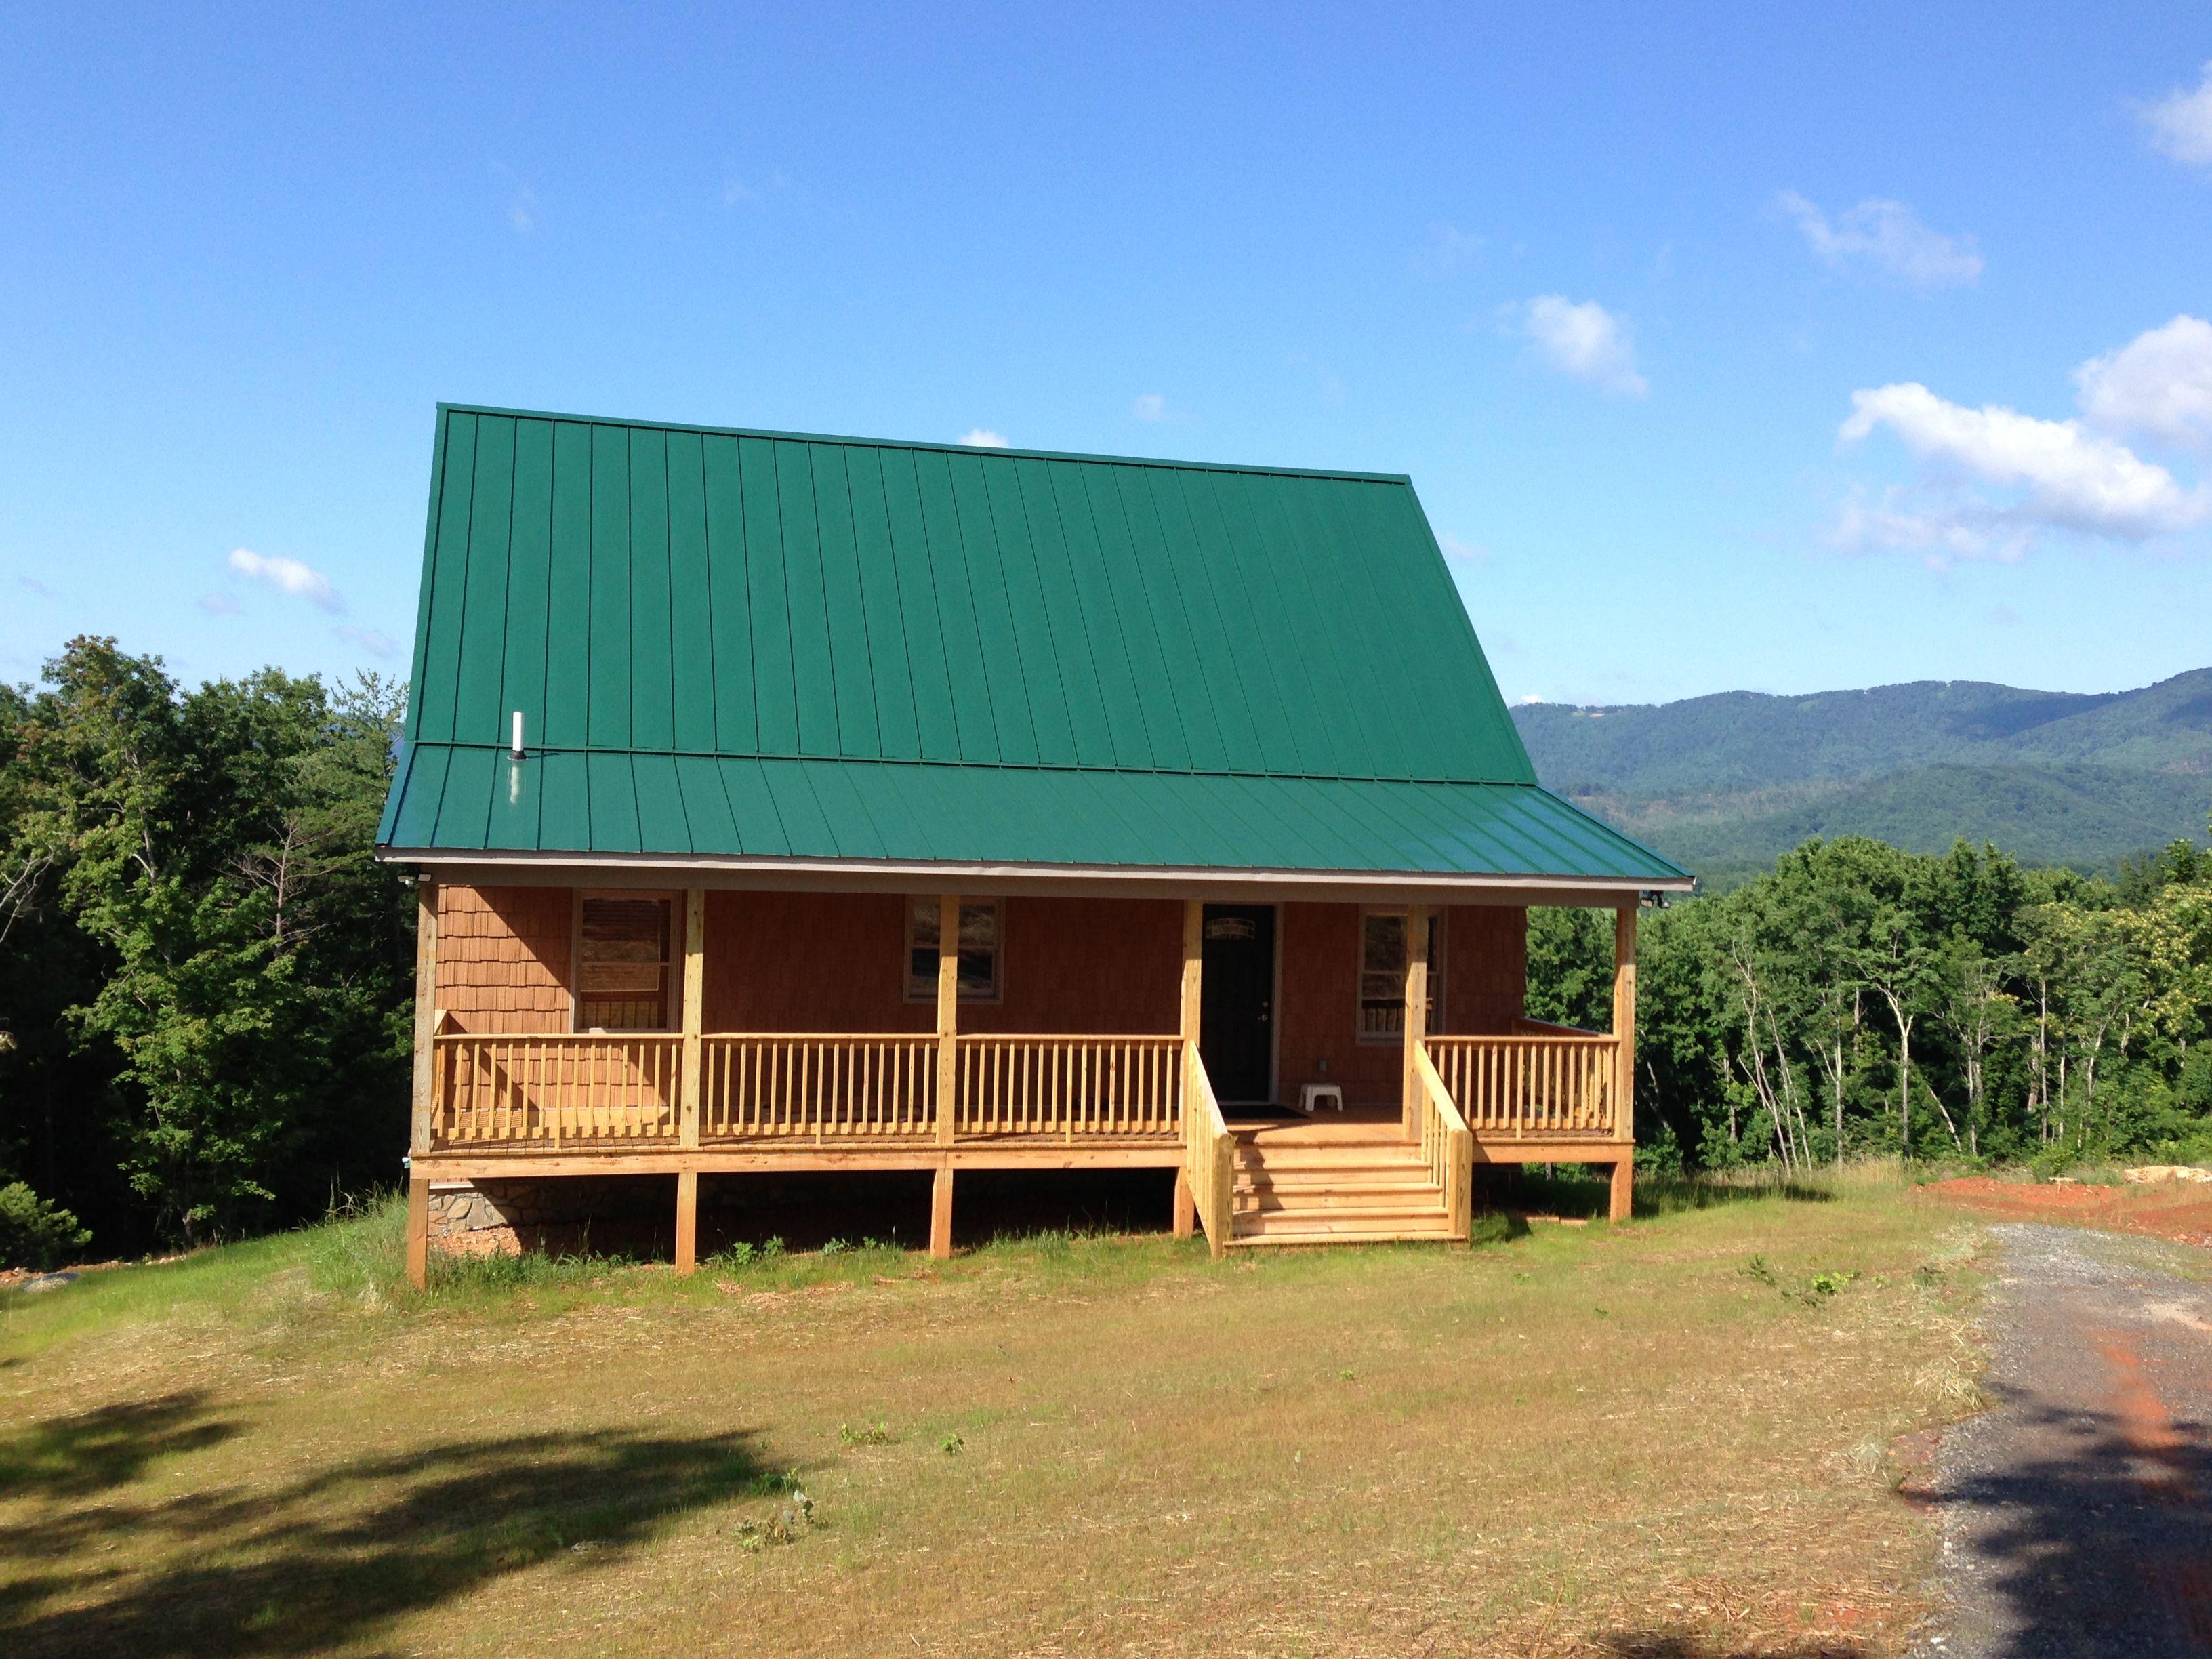 Blue Ridge Parkway, Mabry Mill, Chateau Morrisette Winery